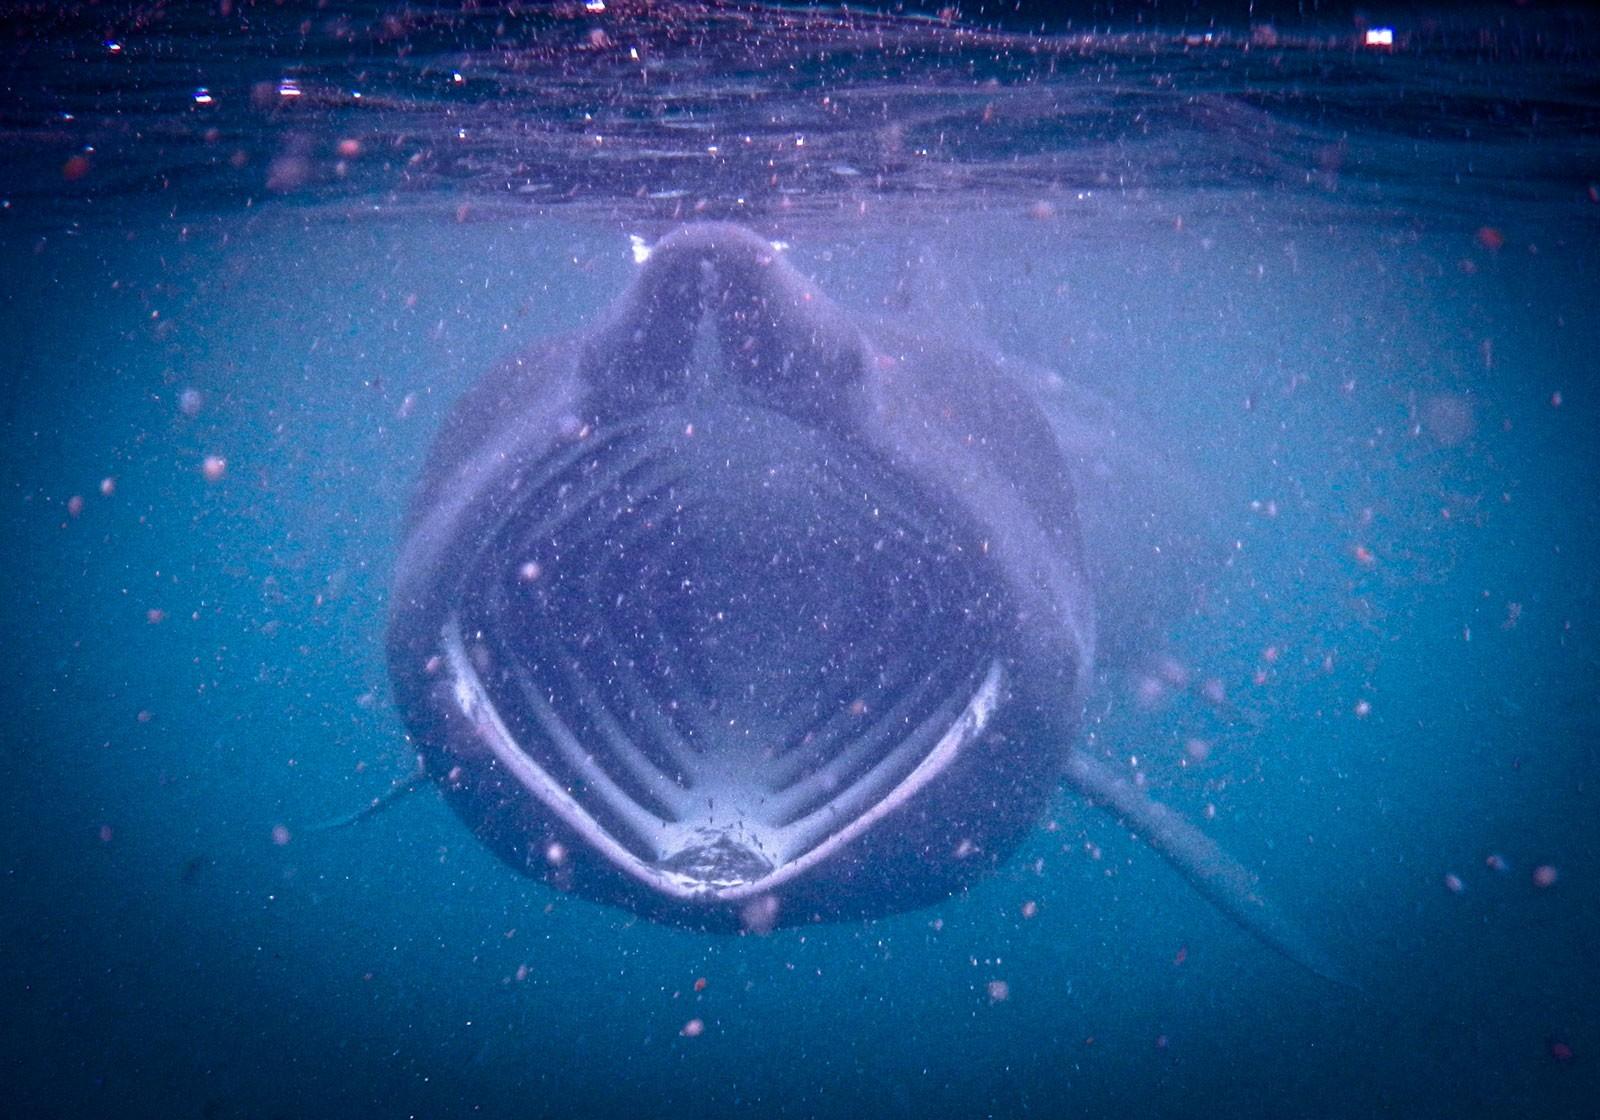 Basking-shark-6ff36c6